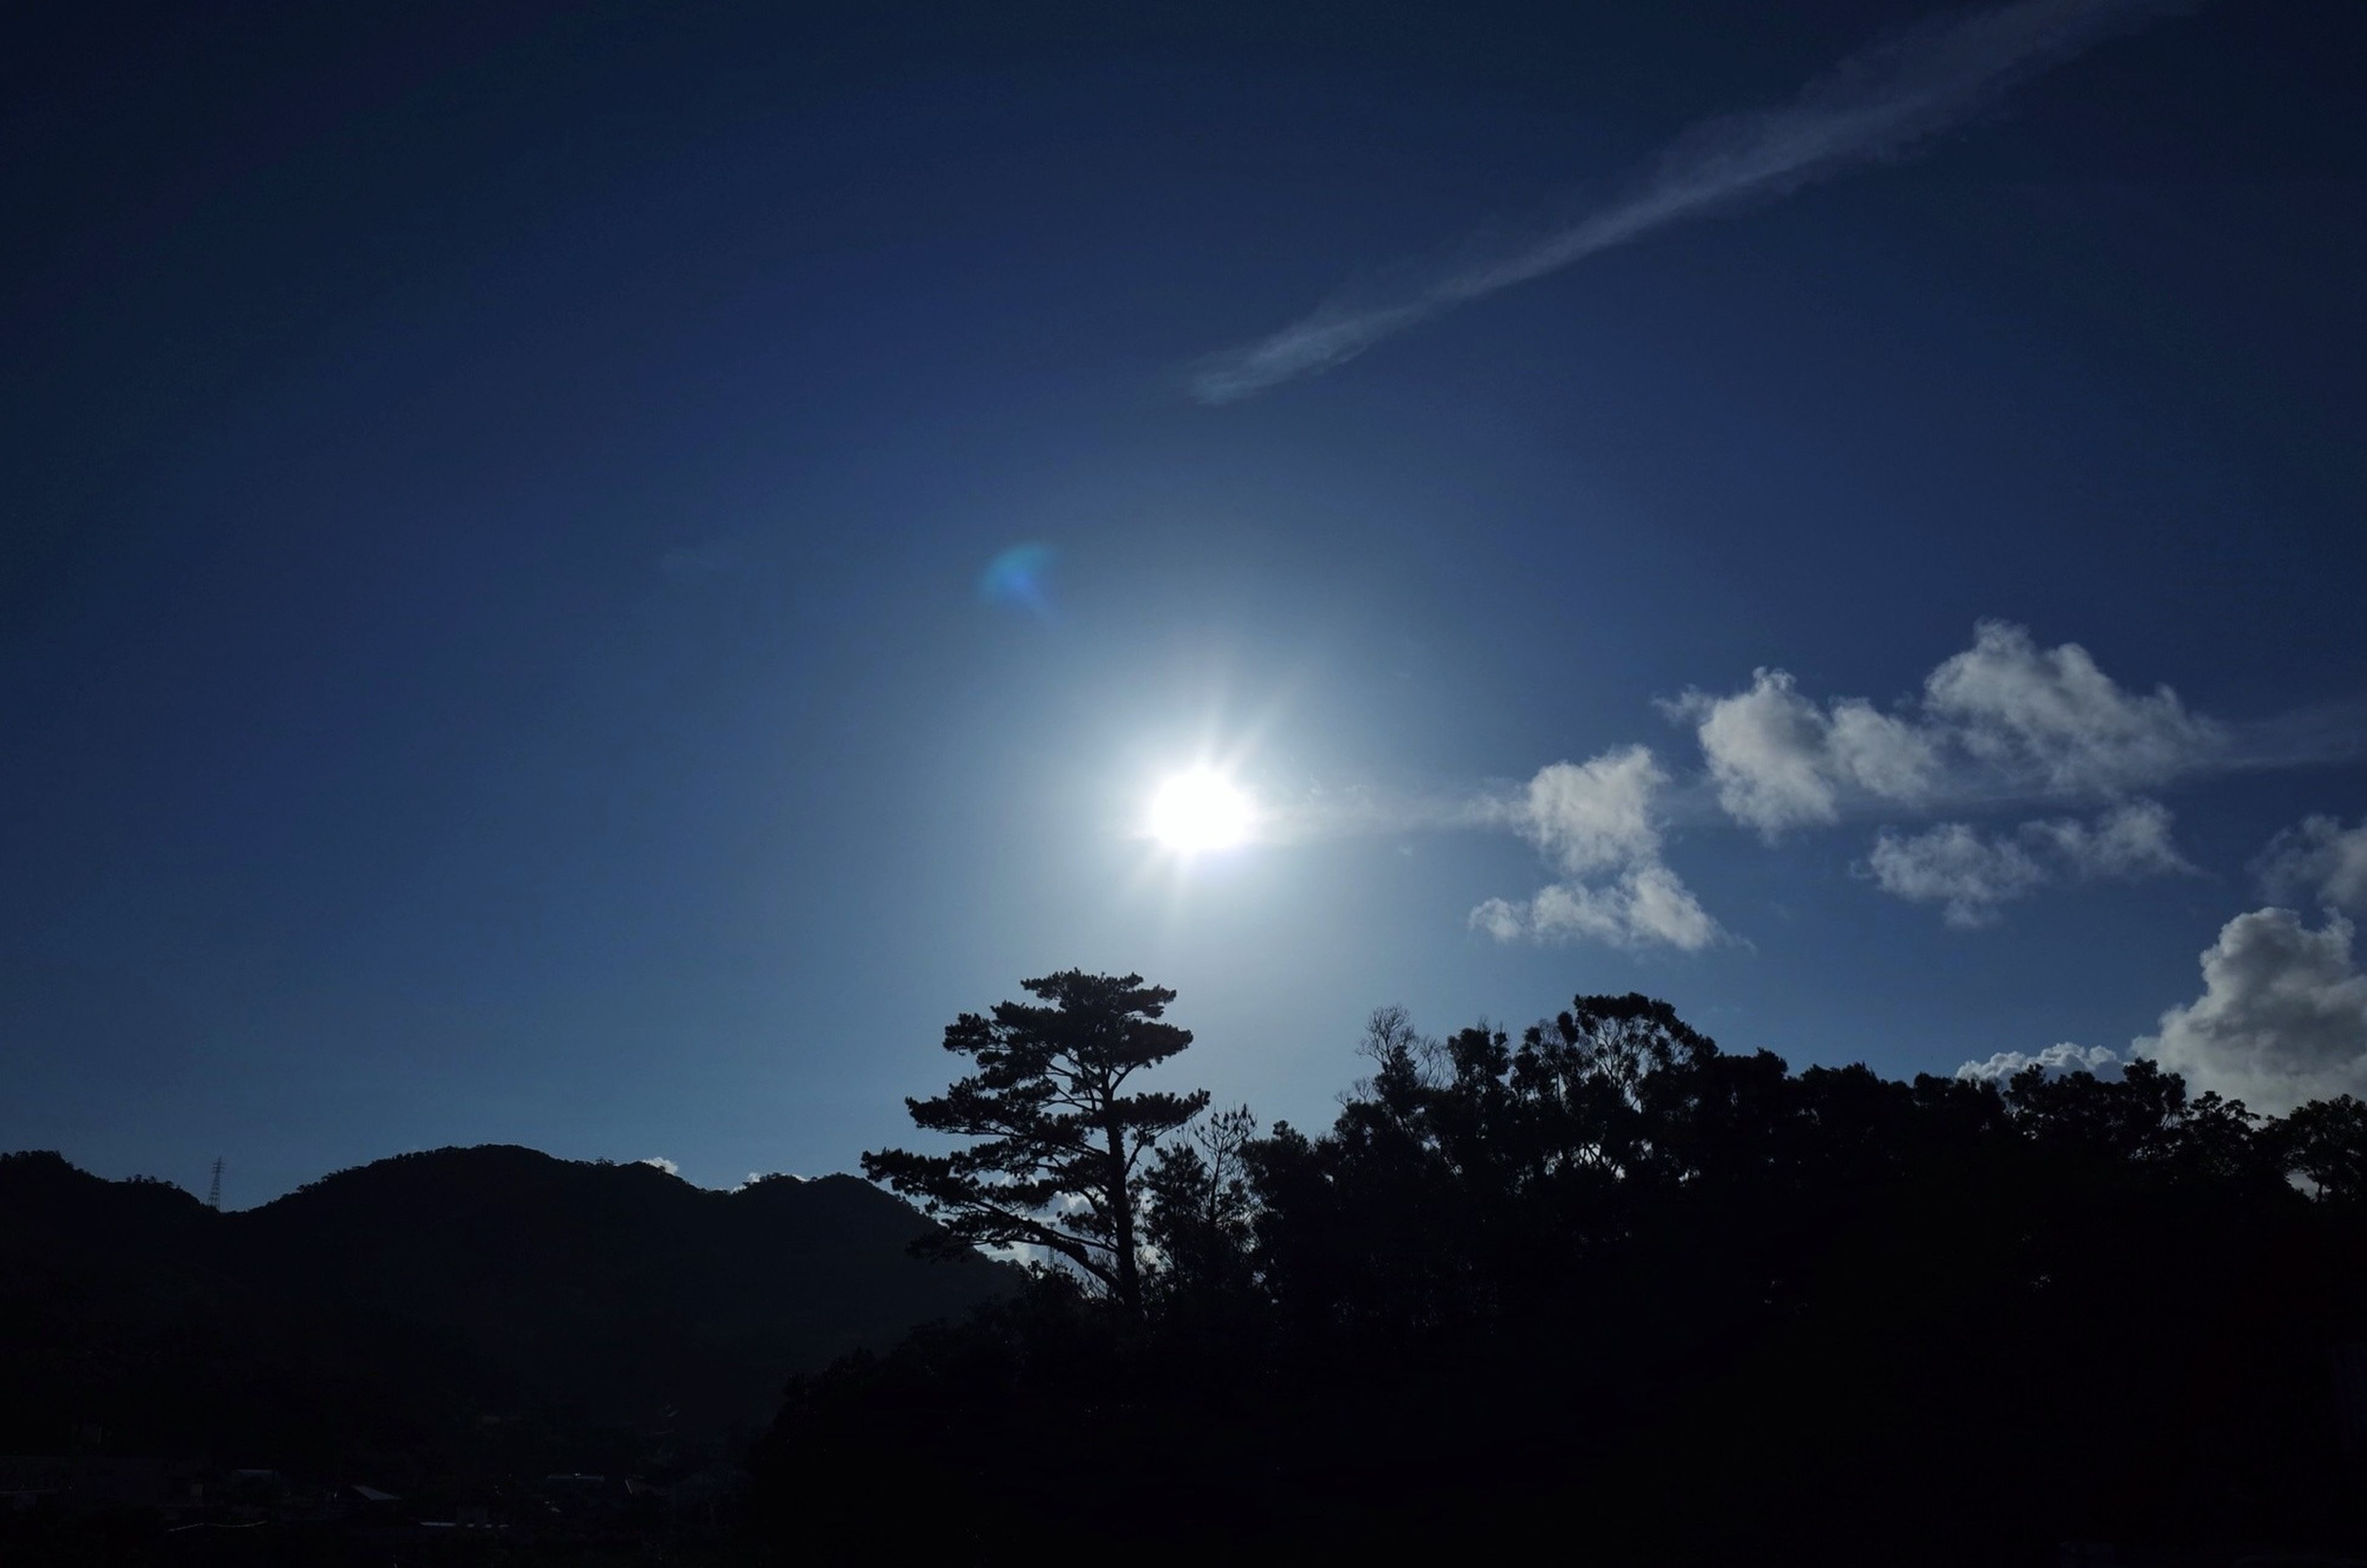 sun, tranquil scene, tranquility, scenics, beauty in nature, sunbeam, silhouette, sunlight, sky, mountain, tree, nature, lens flare, landscape, blue, idyllic, low angle view, non-urban scene, mountain range, outdoors